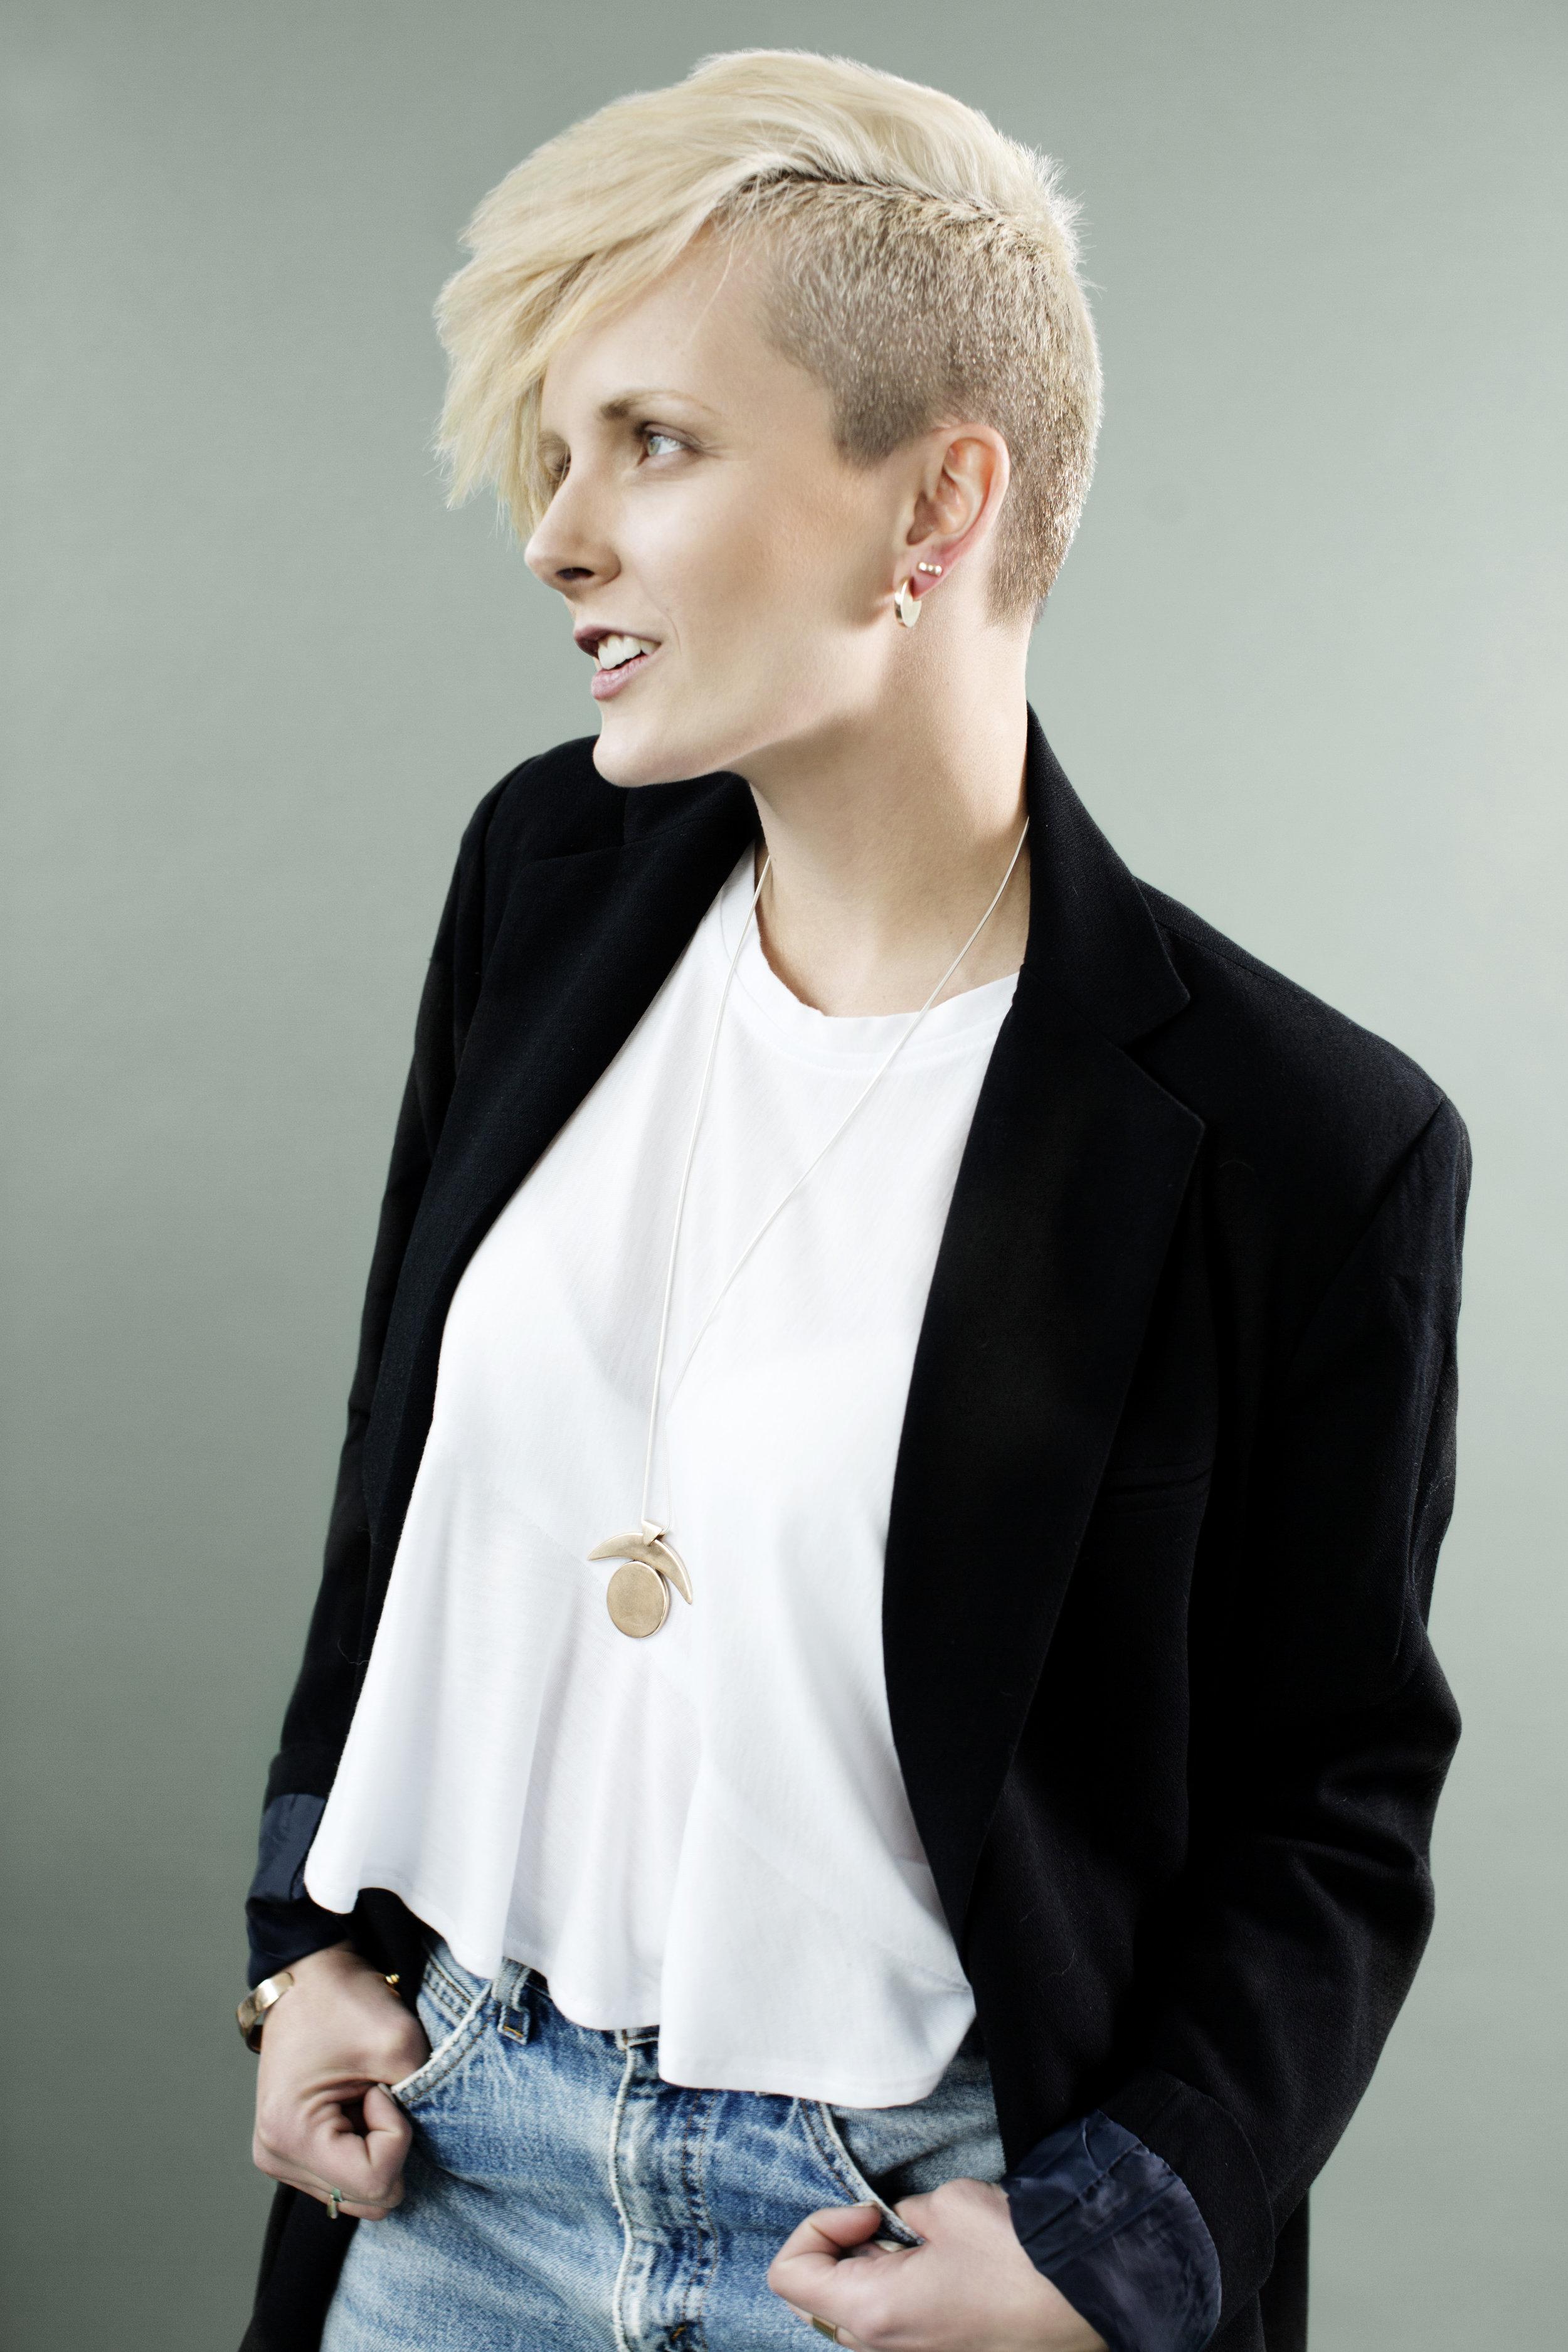 NOVA Collection - Photography -Eliesa JohnsonArt Direction & Stying -Bodega, LtdHair & Makeup -Romeny ChanModel -Heather Byington